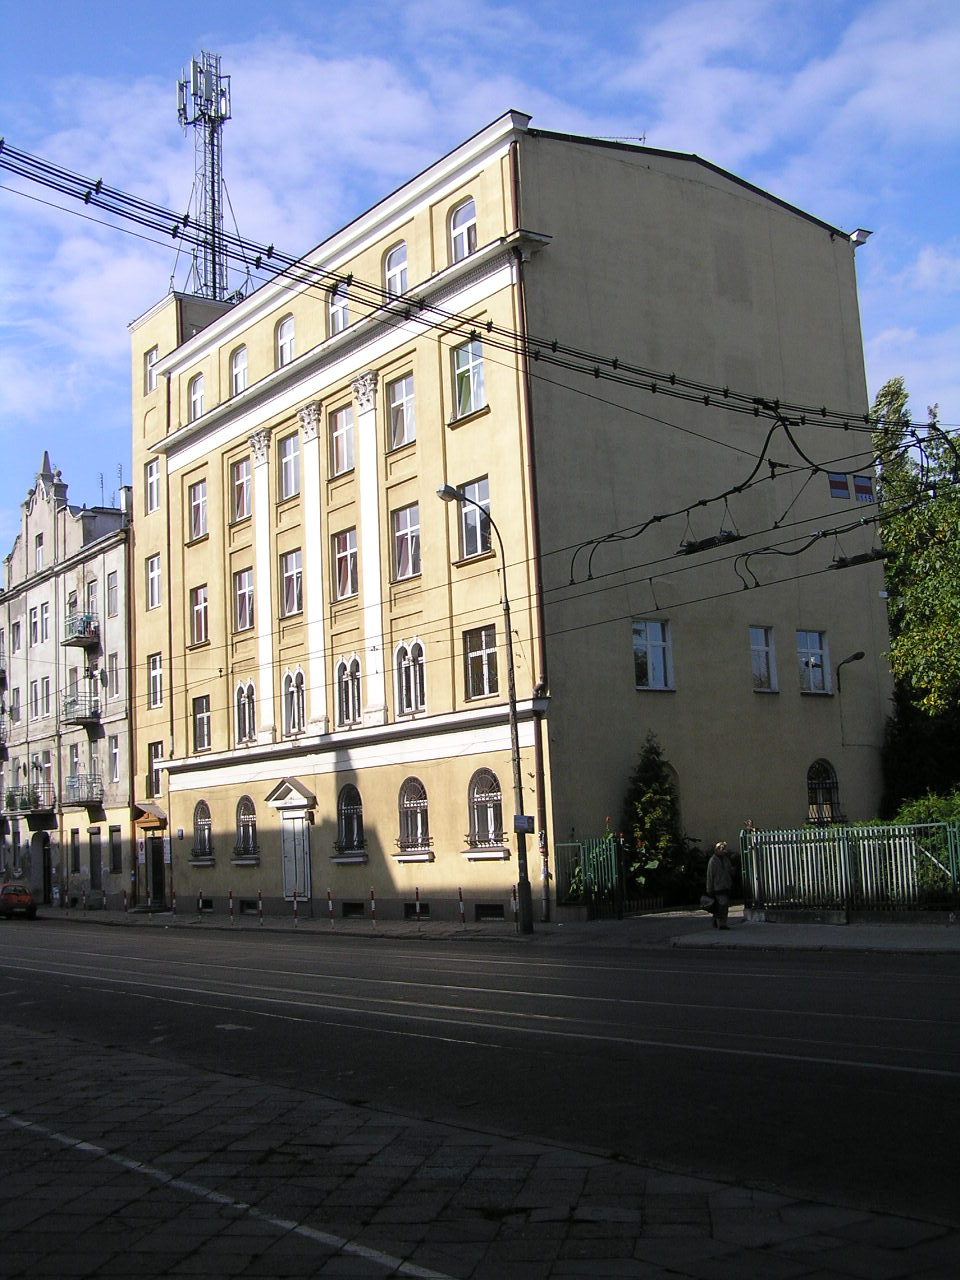 Kawęczyńska 49 - Dom Caritasu